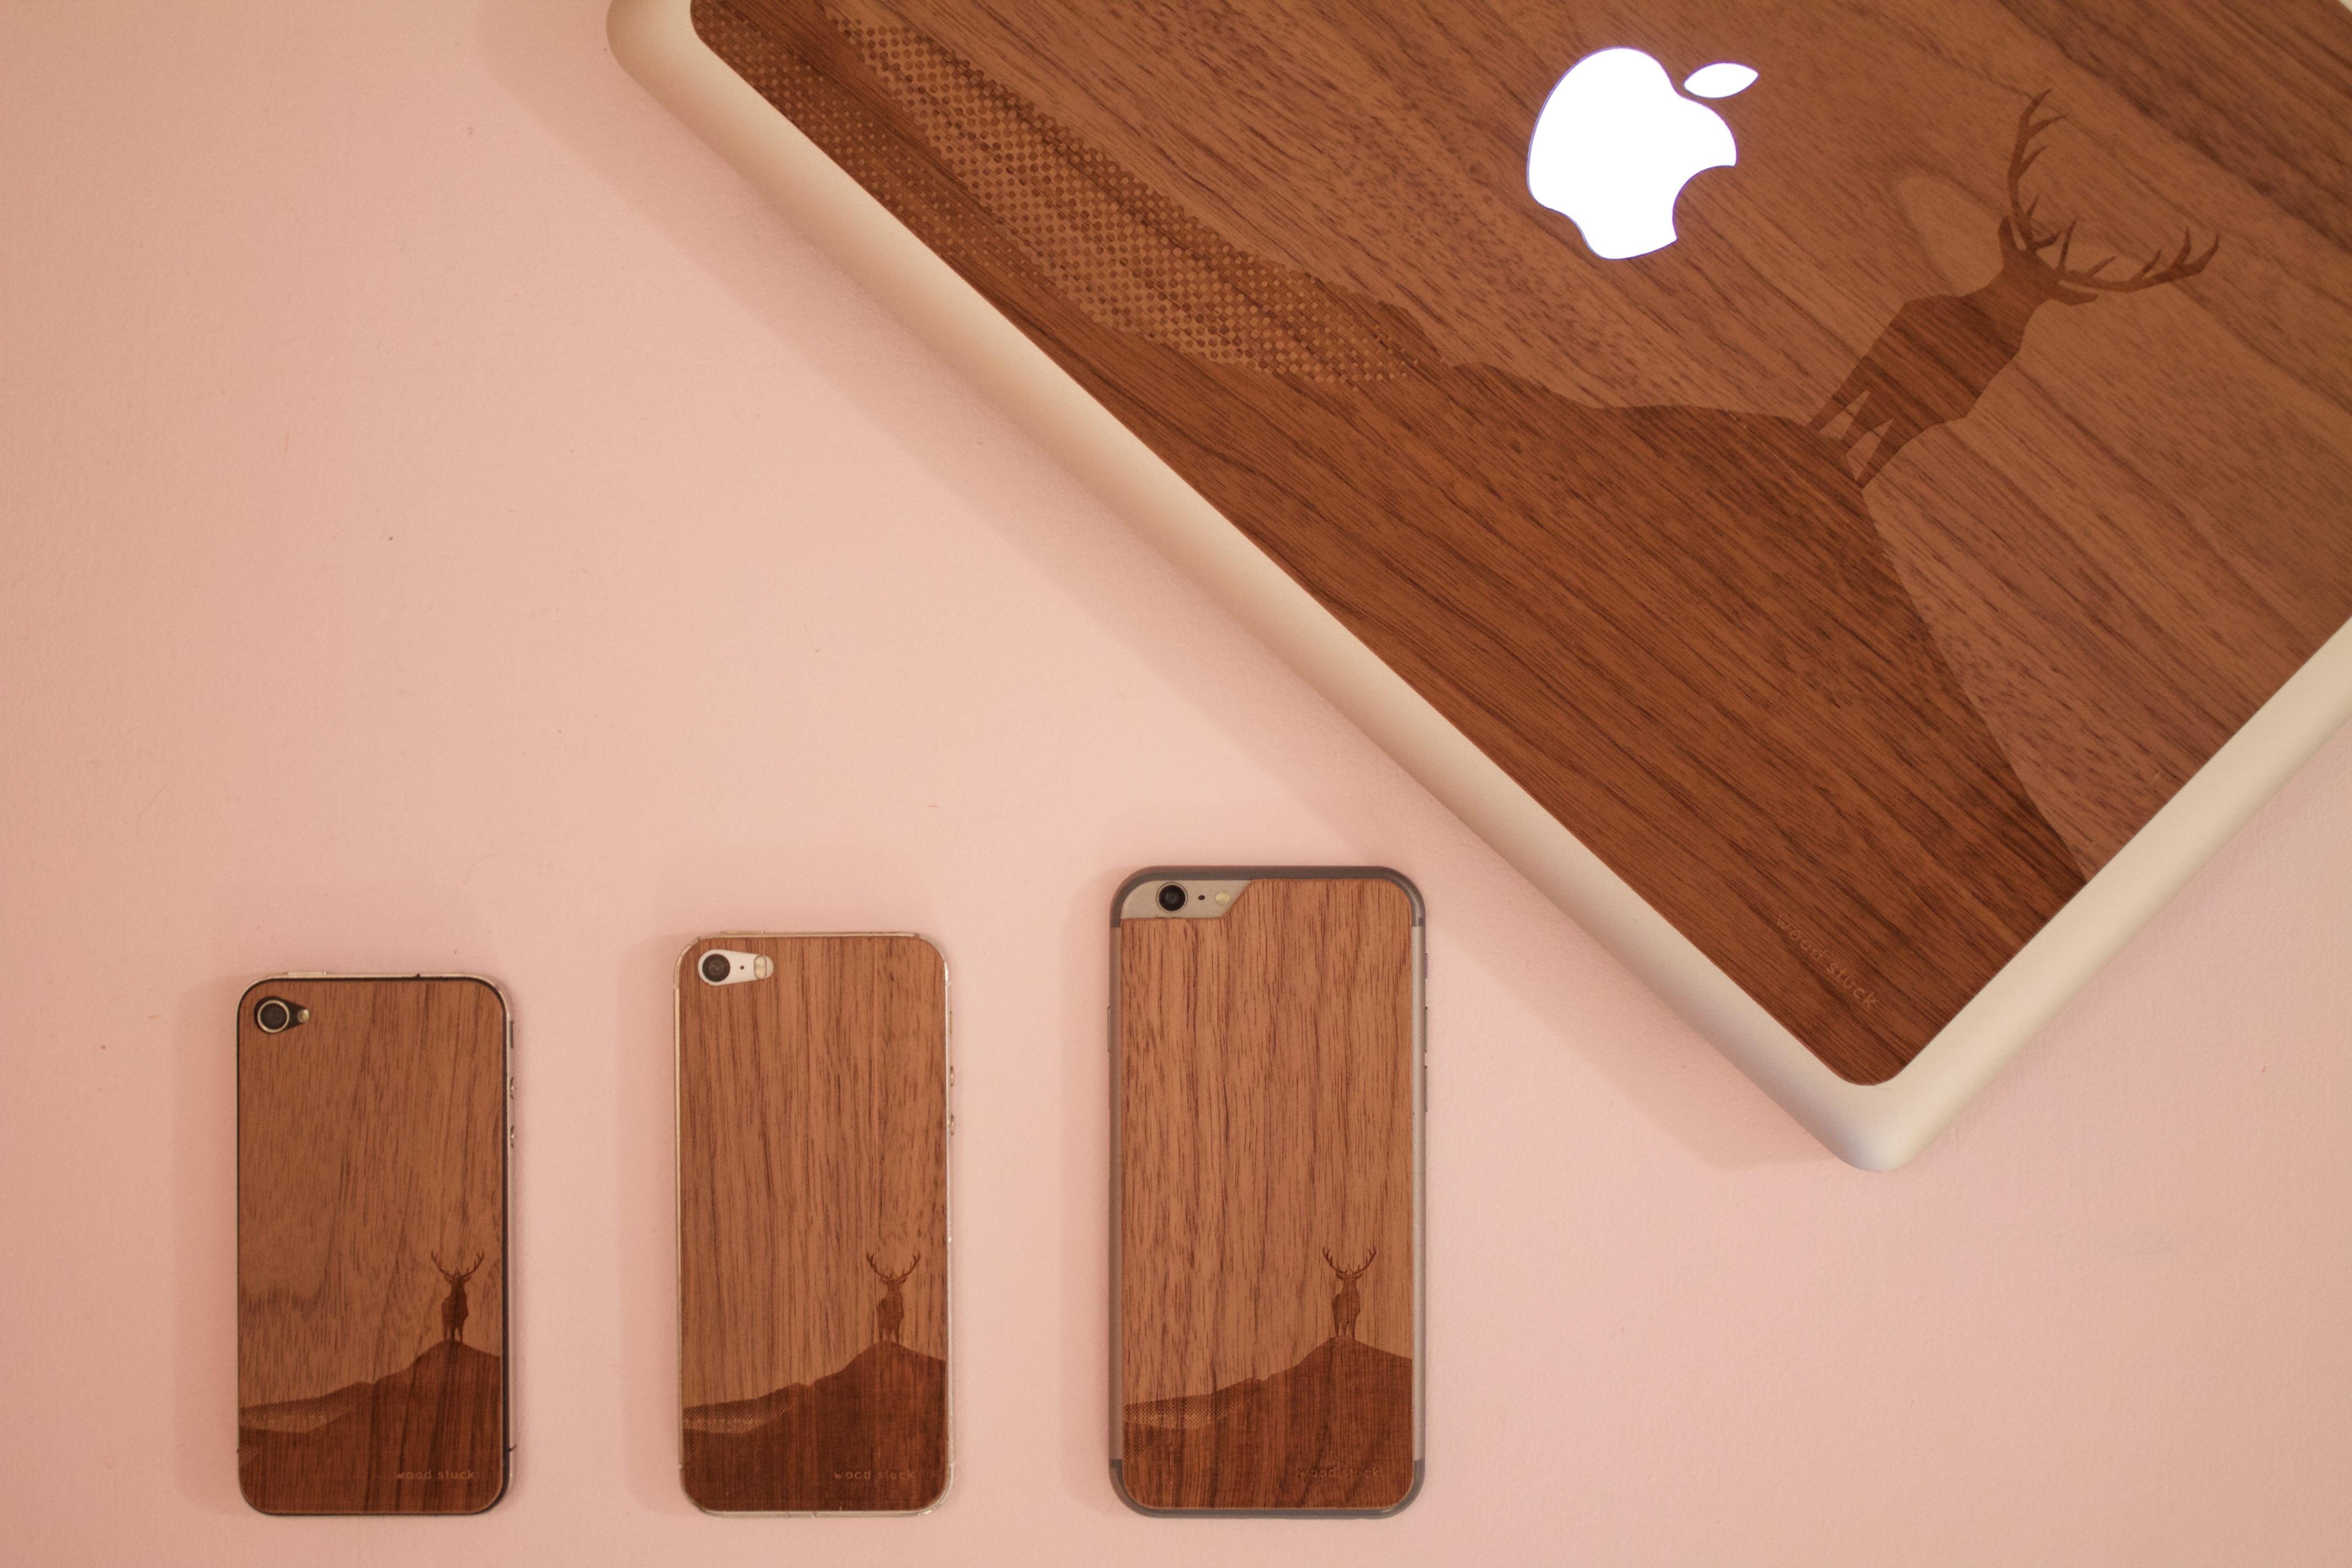 woodstuck coques en bois